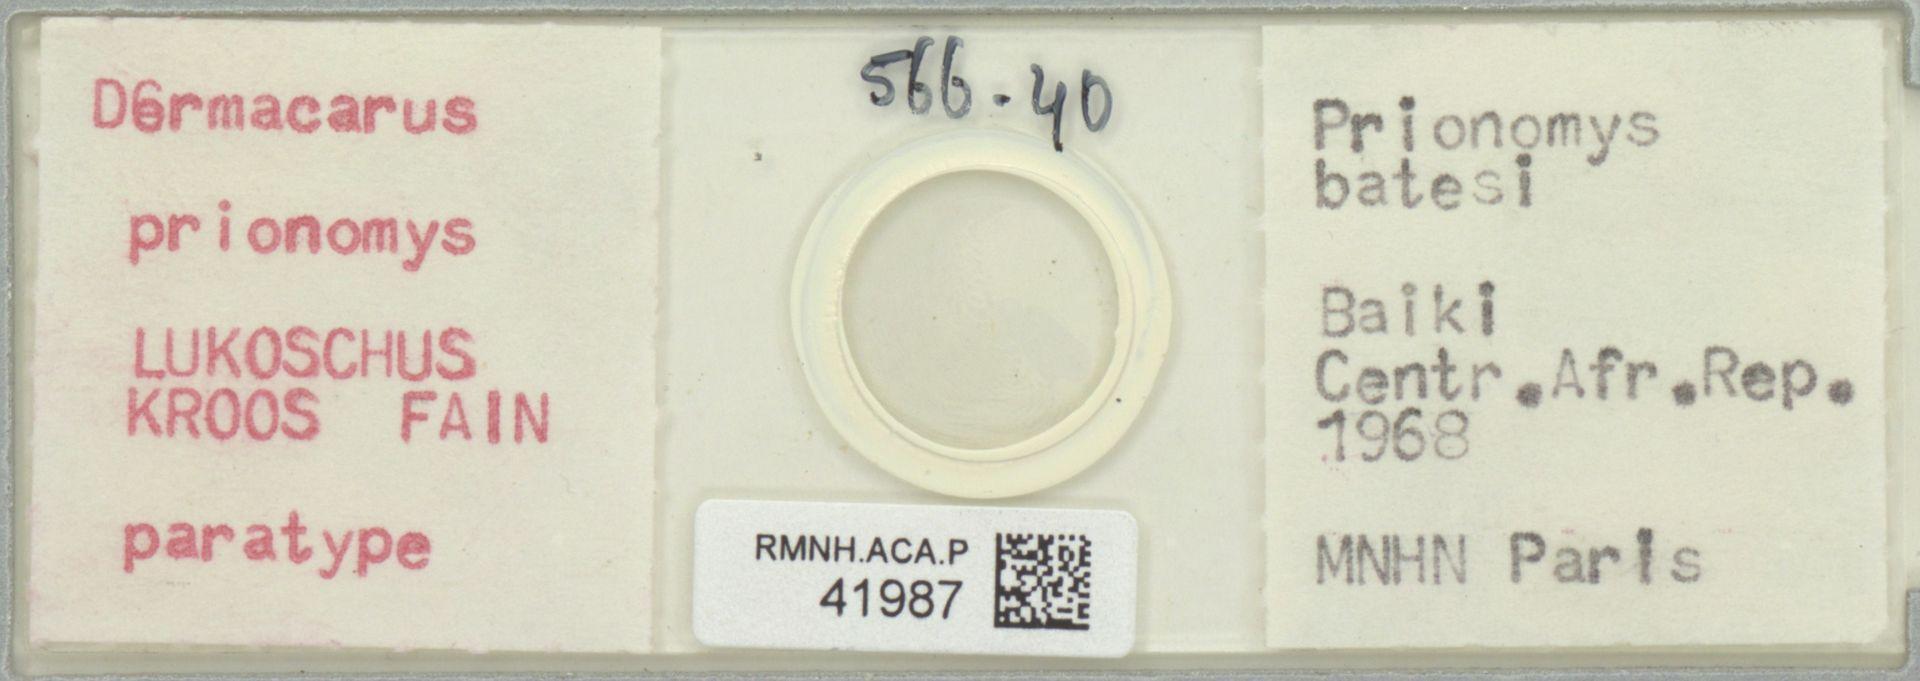 RMNH.ACA.P.41987 | Dermacarus prionomys Lukoschus, Kroos, Fain